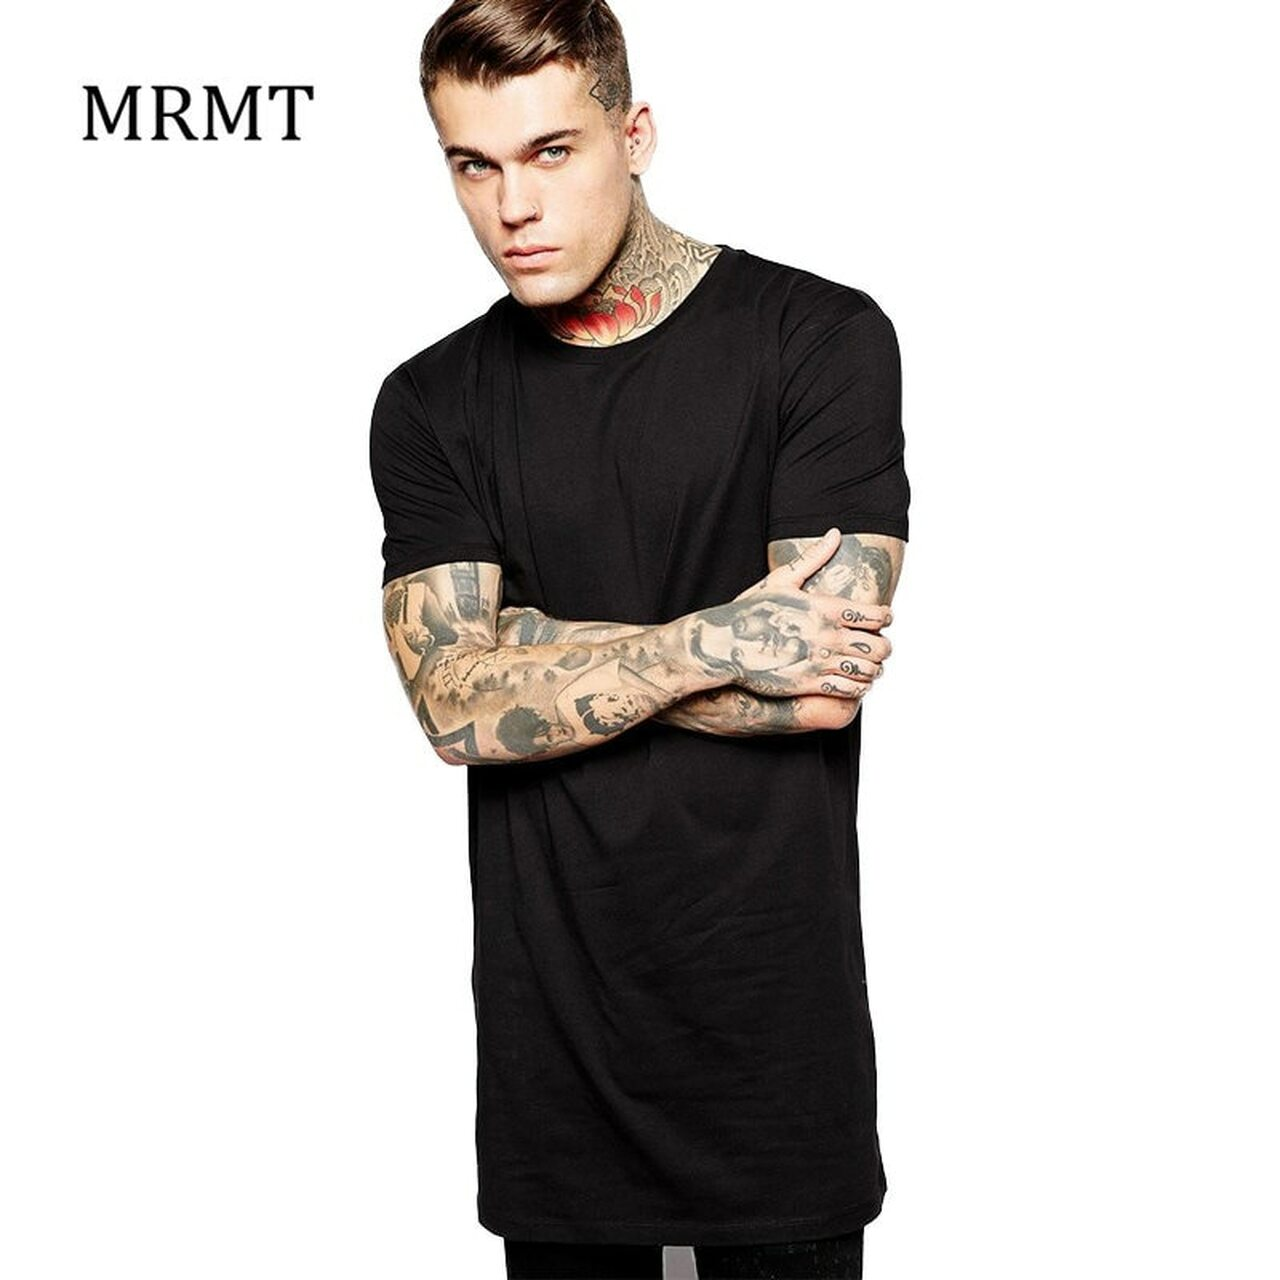 2018 Brand New Clothing Mens Black Long t shirt Men Tops Hip hop tee  T-shirt Men Hiphop Short Sleeve Longline casual Tee shirts